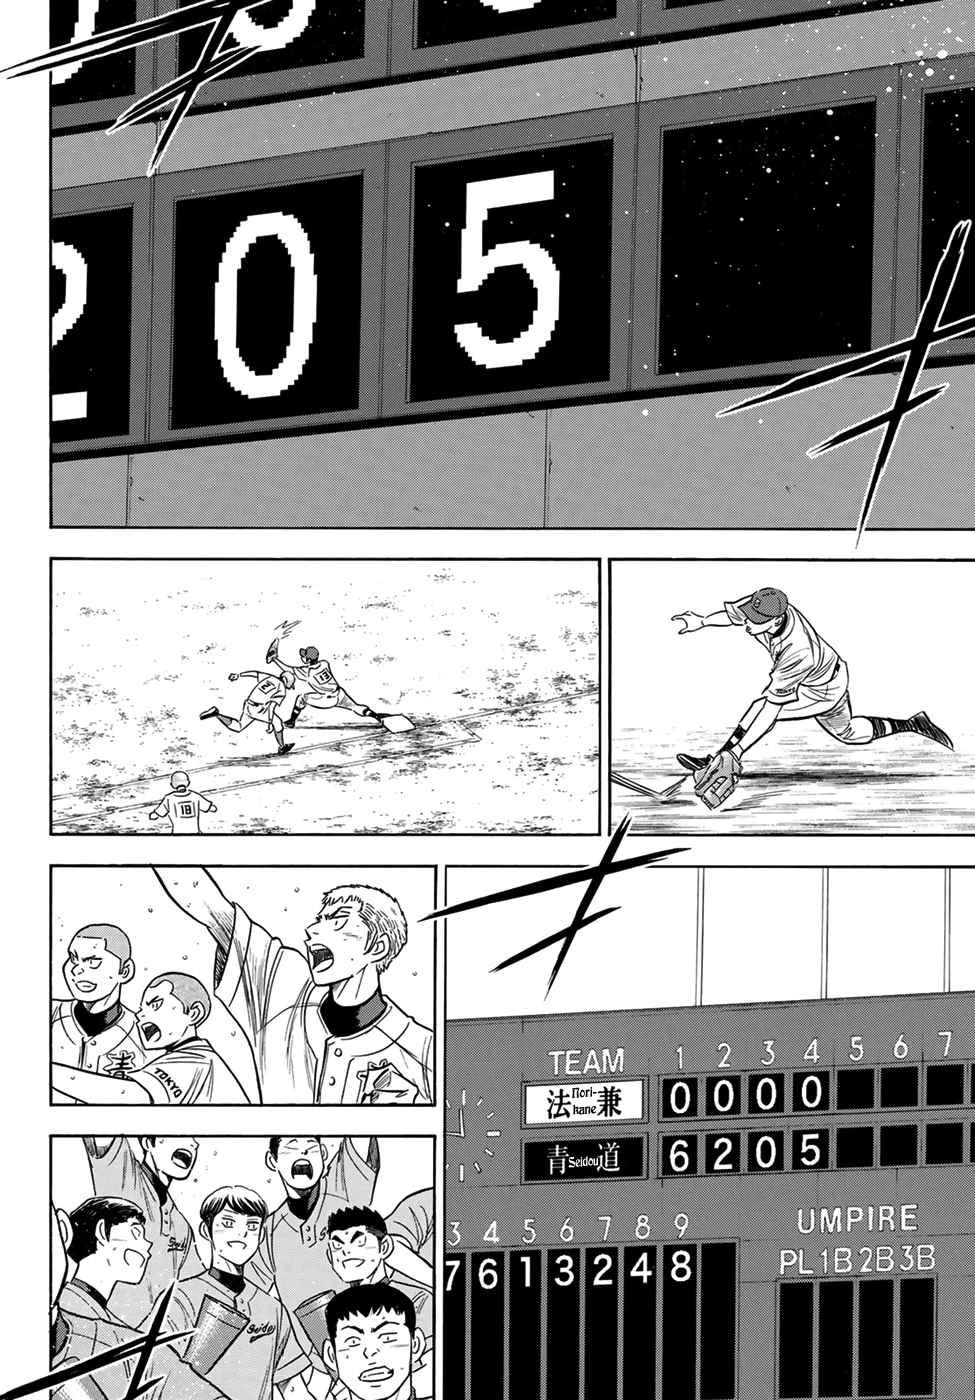 https://manga.mangadogs.com/comics/pic2/14/17678/1042123/3e5fa5d77c90f90b0ddb3c43f64c2a78.jpg Page 2